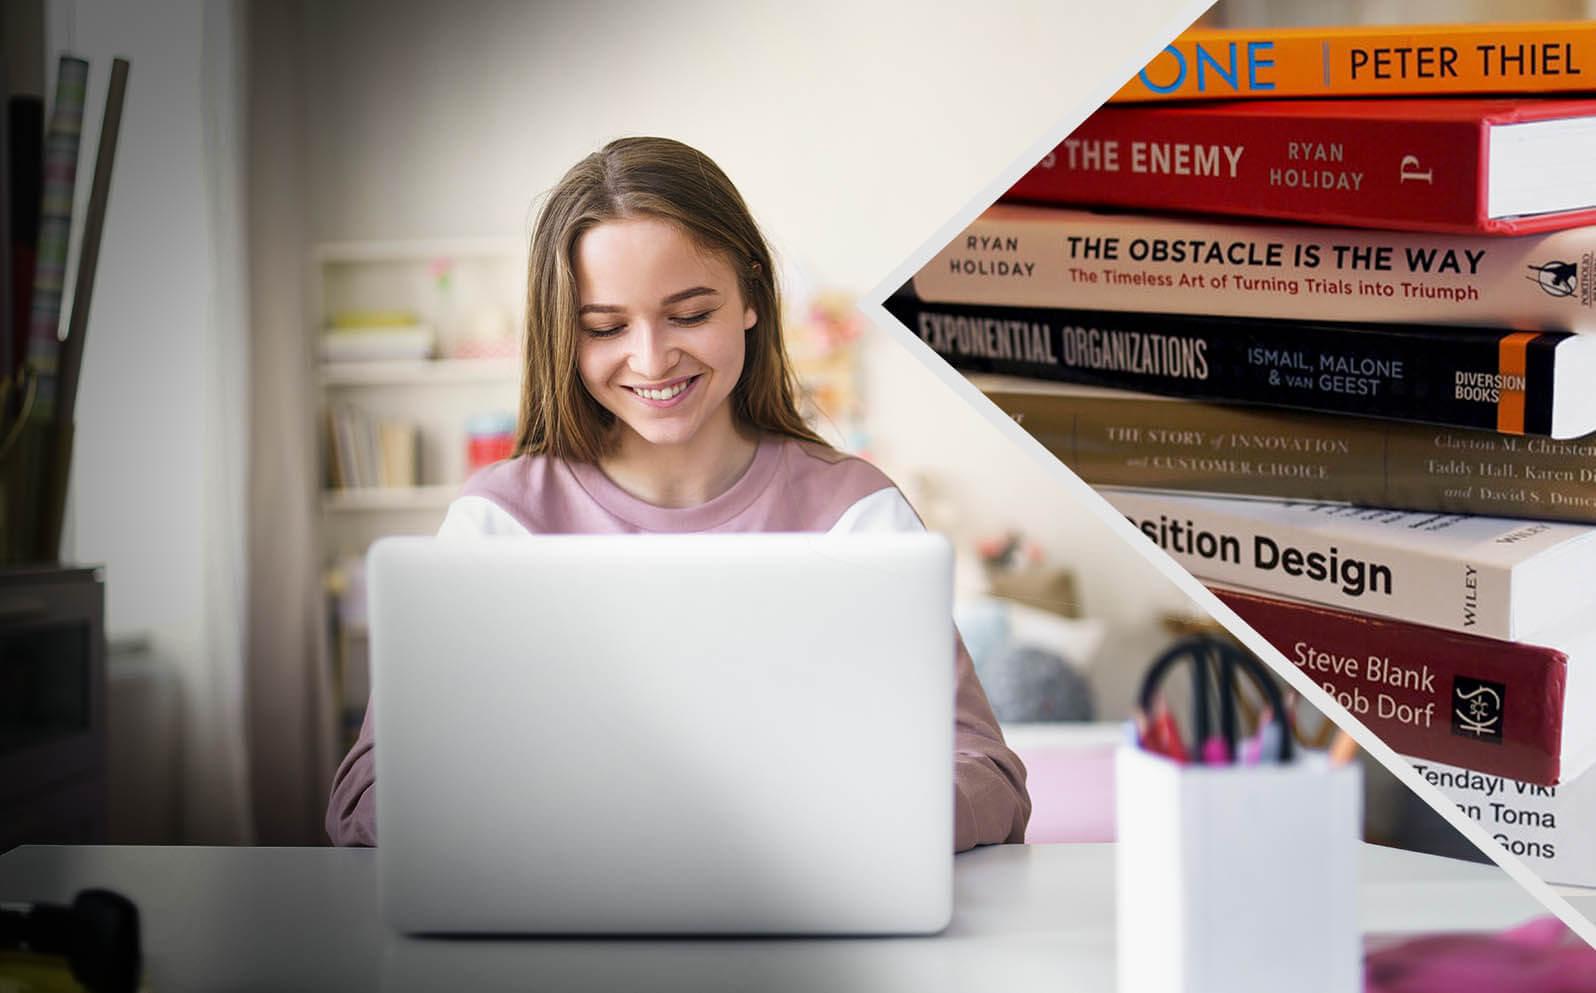 Business Management Online Insights Online Summer School for Ages 13-18